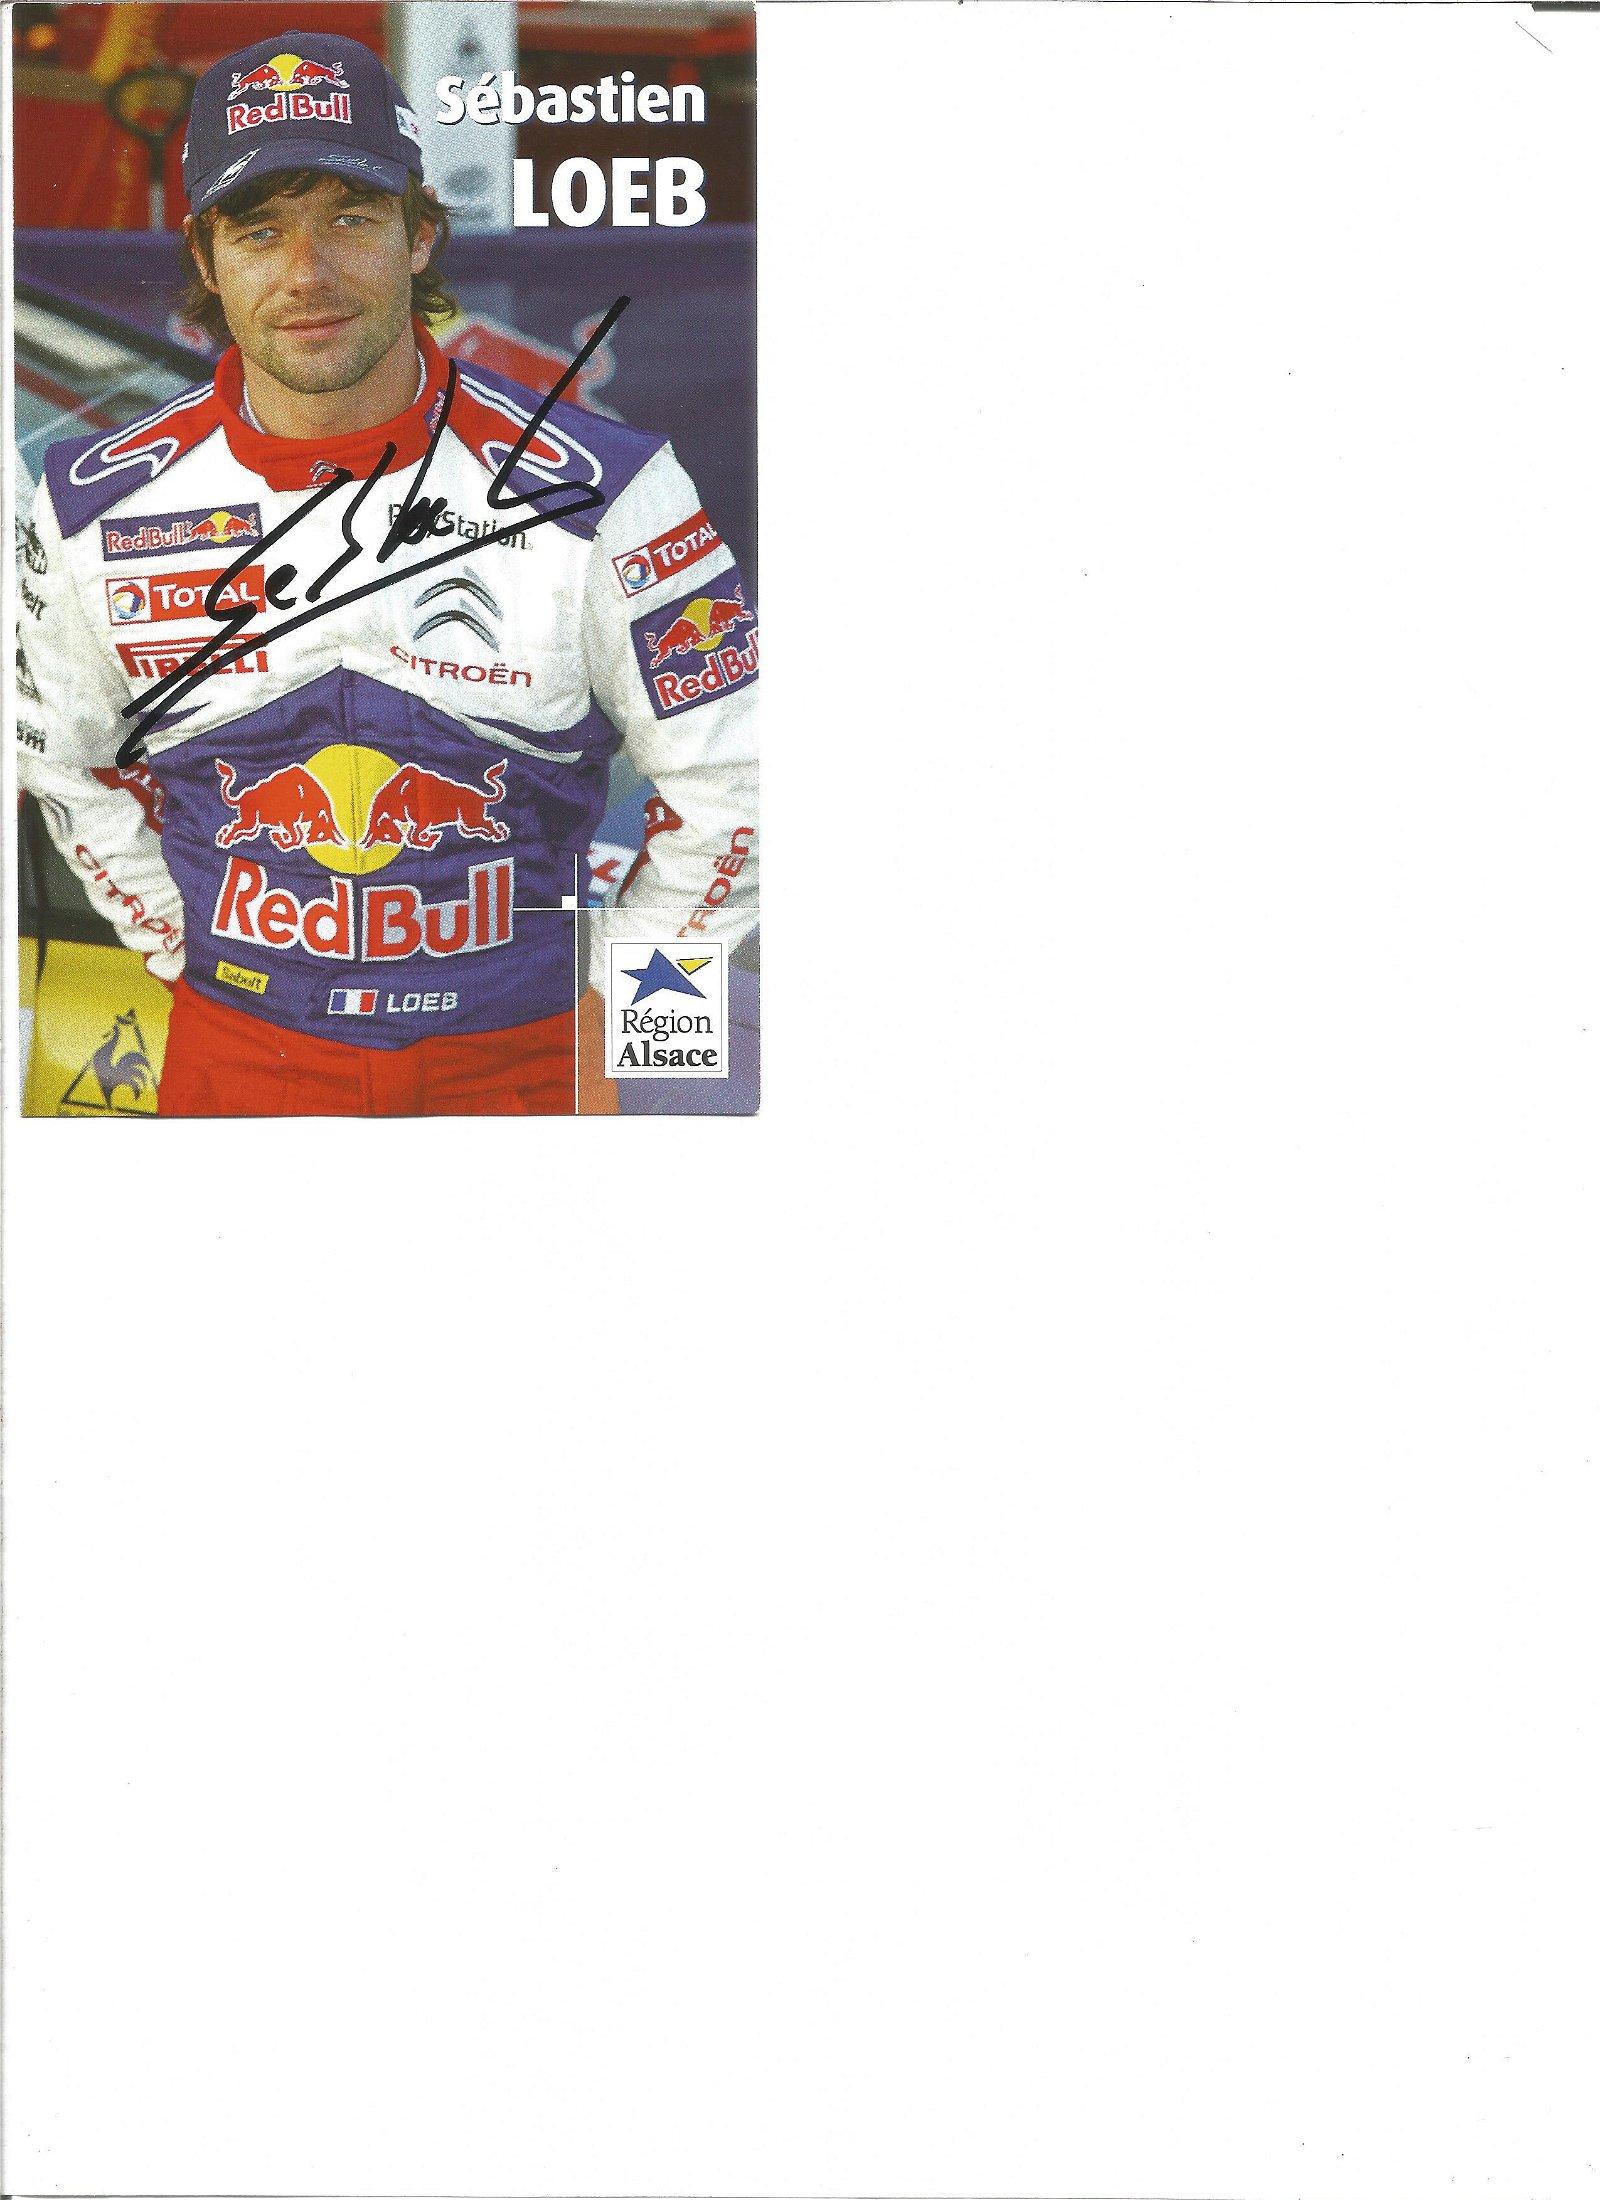 Motorsport Sebastian Loeb signed 6x4 Red Bull promo